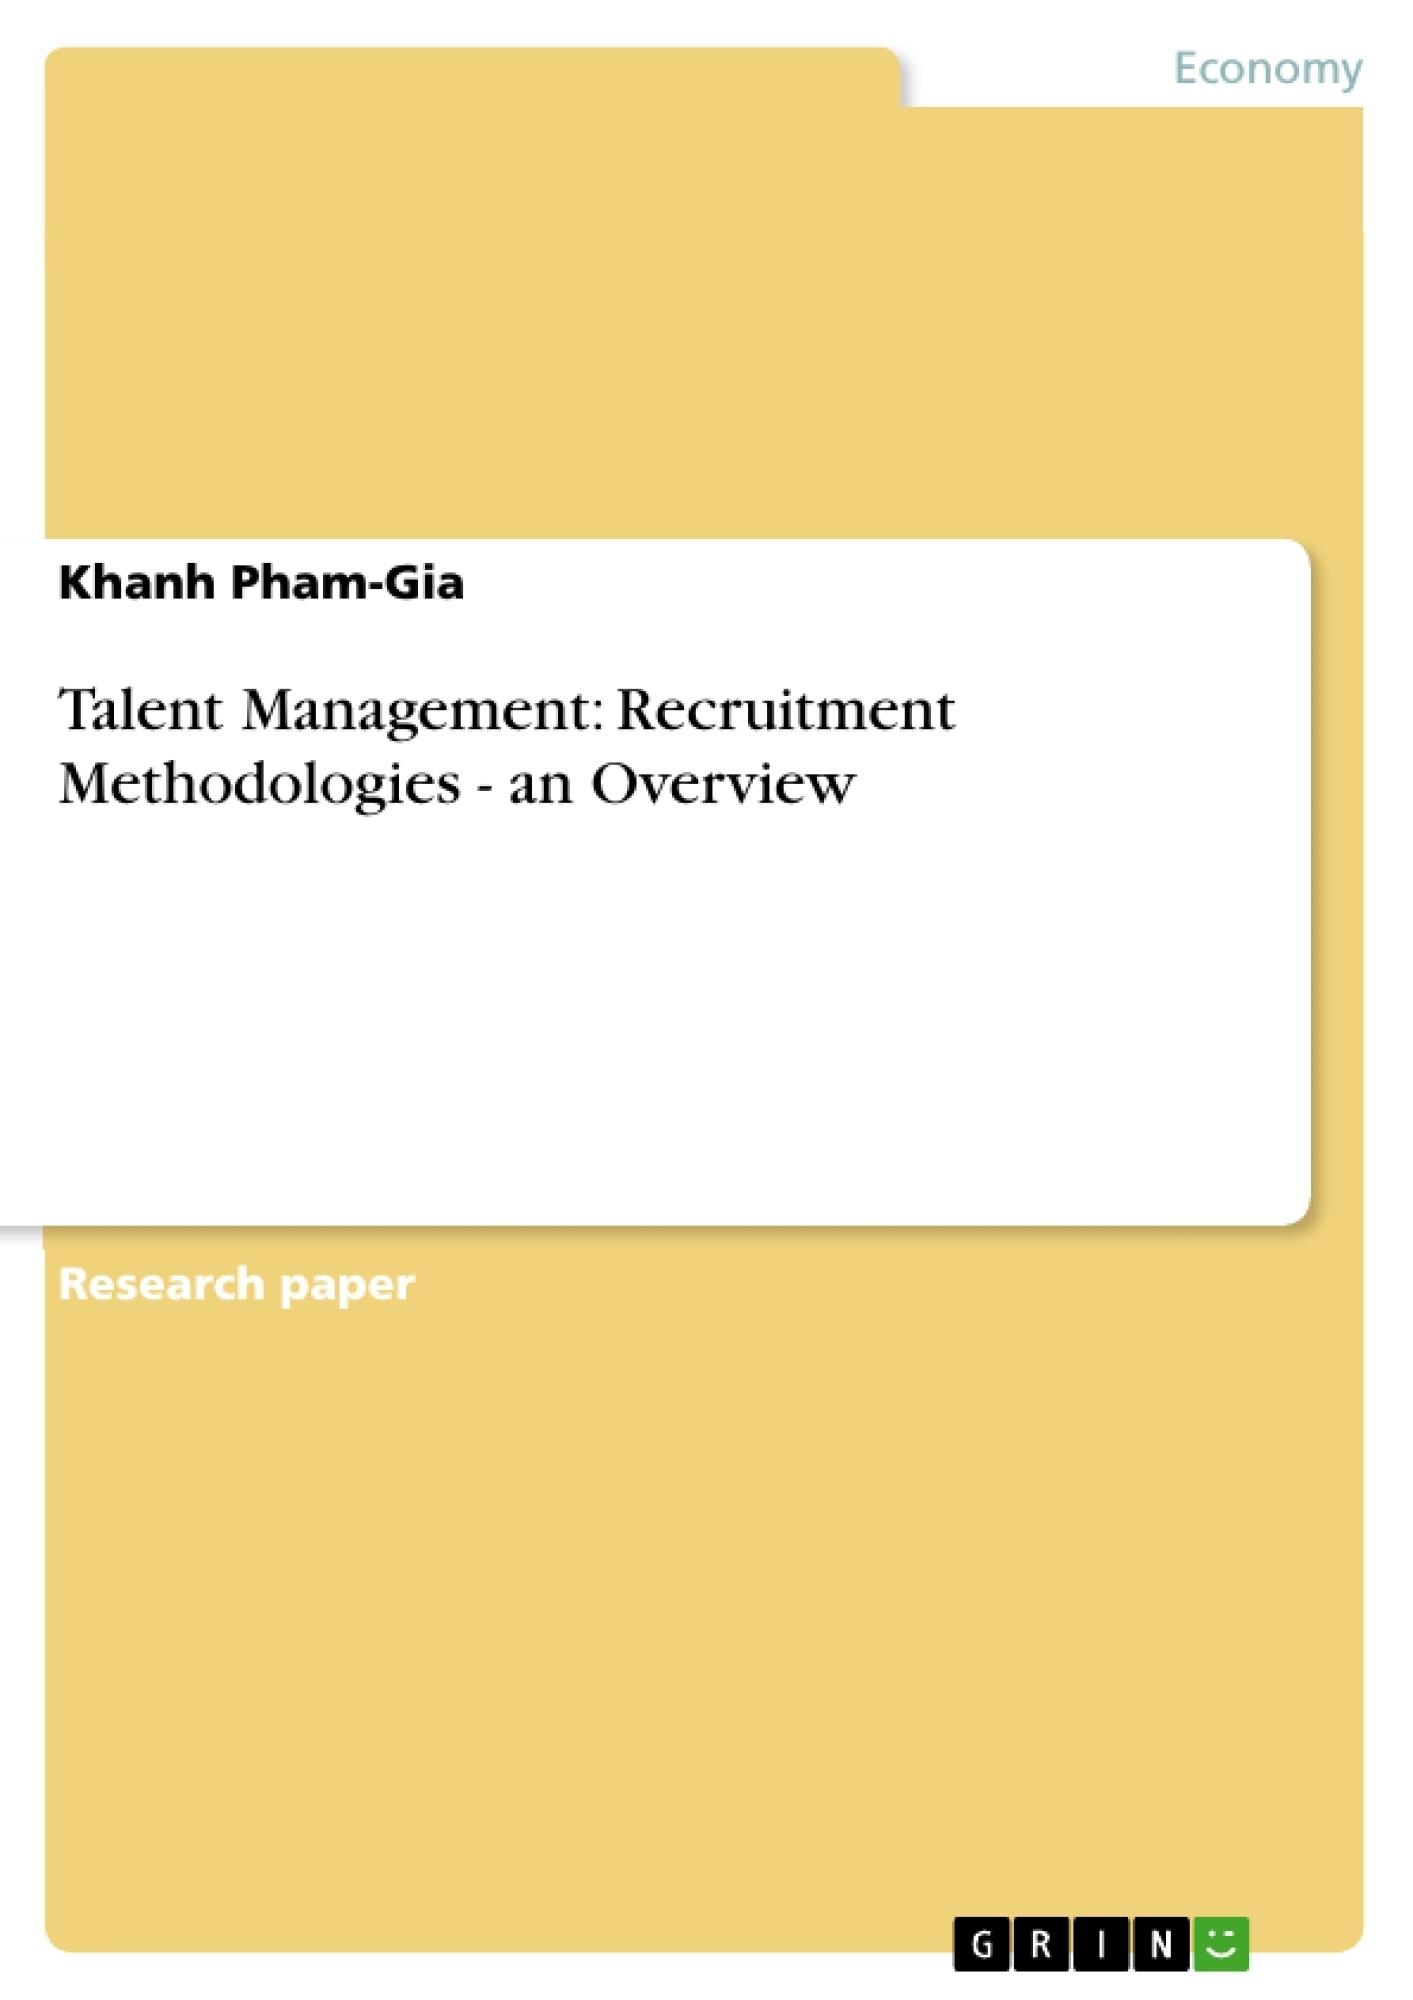 Title: Talent Management: Recruitment Methodologies - an Overview